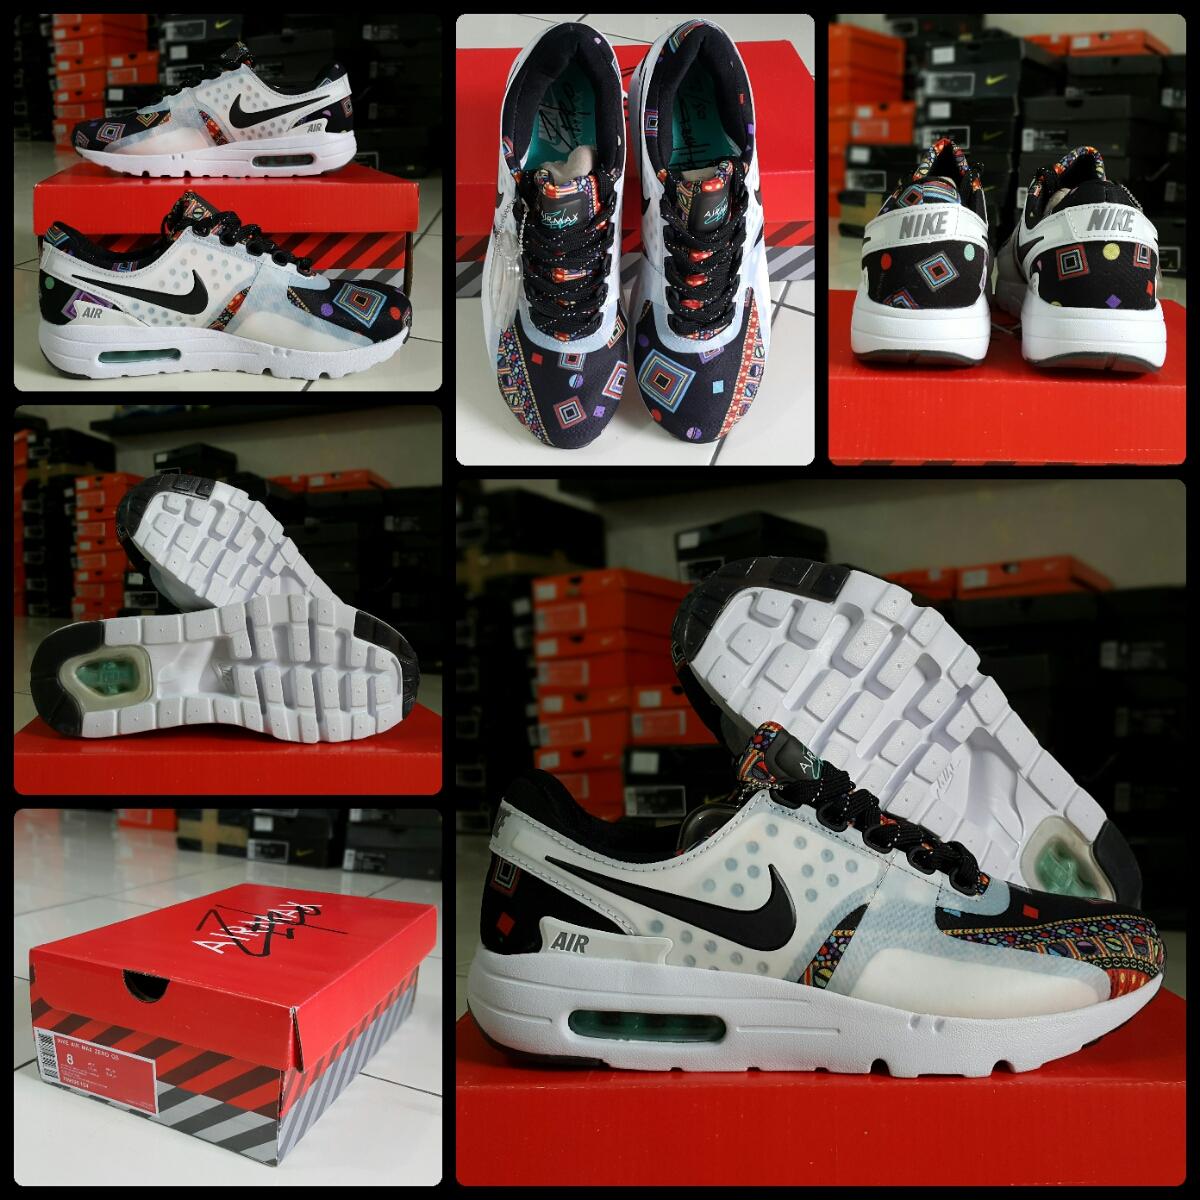 ireland jual sepatu nike air jordan original 0f2c6 00c8e  where to buy nike  air max zero liberty 14af5 fb517 11e97aa03b